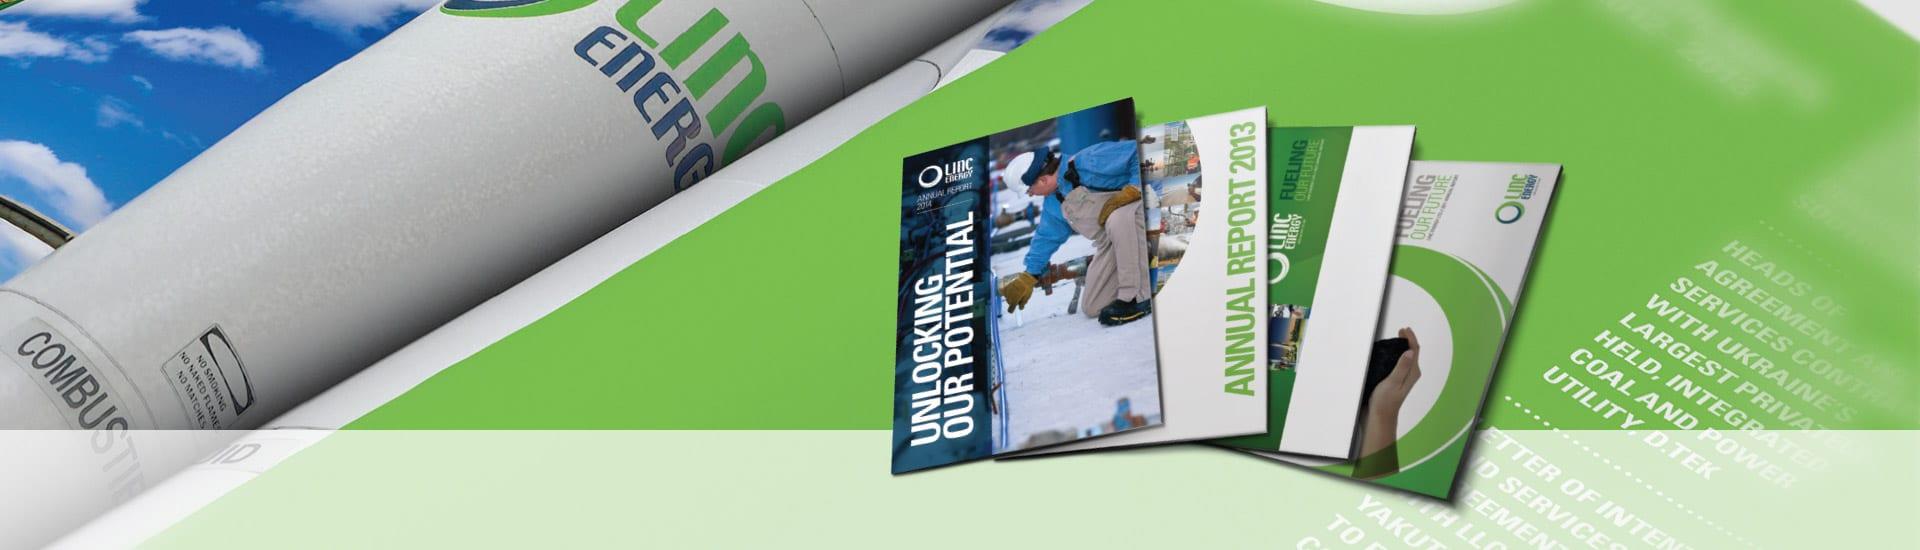 Linc Energy Annual Report Design